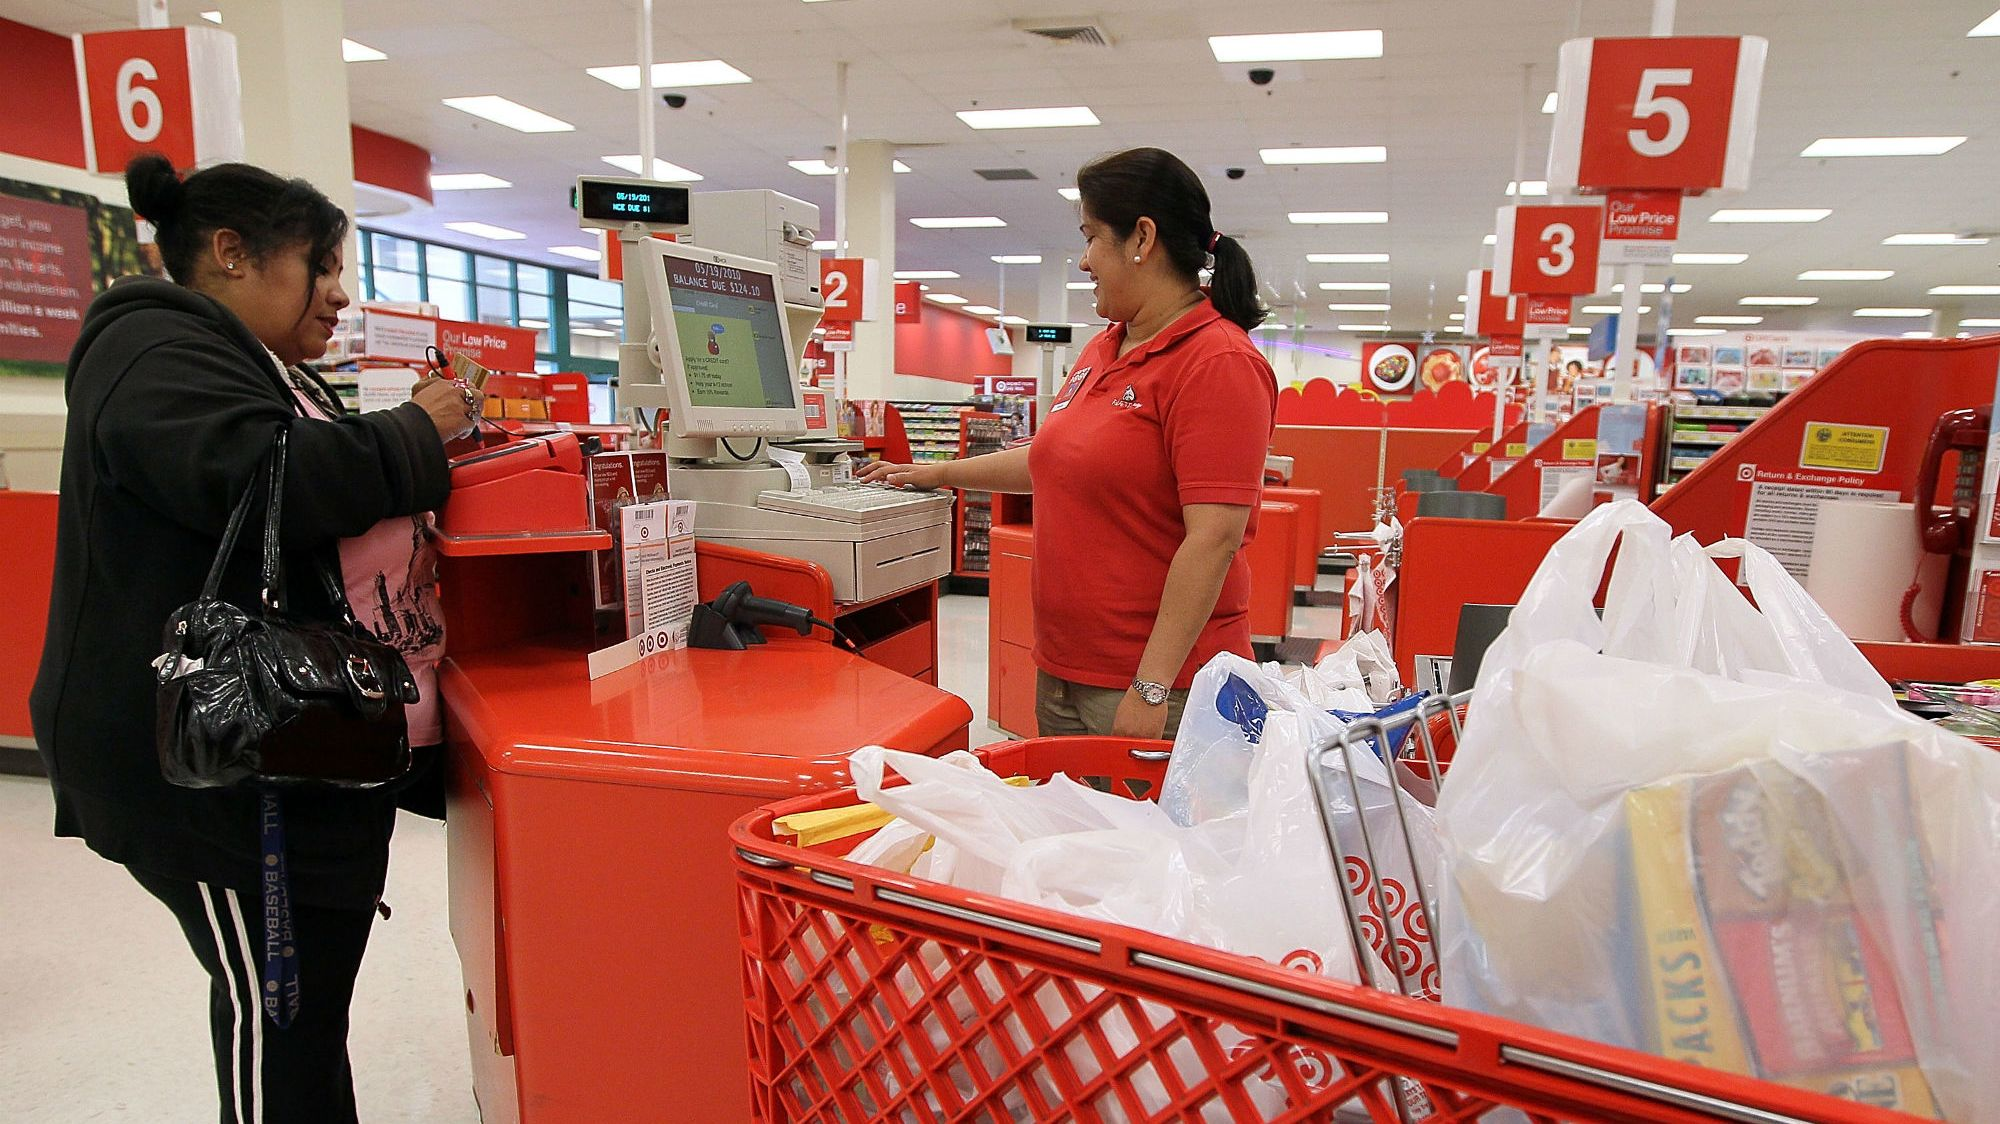 11 Secrets Of Target Employees Mental Floss